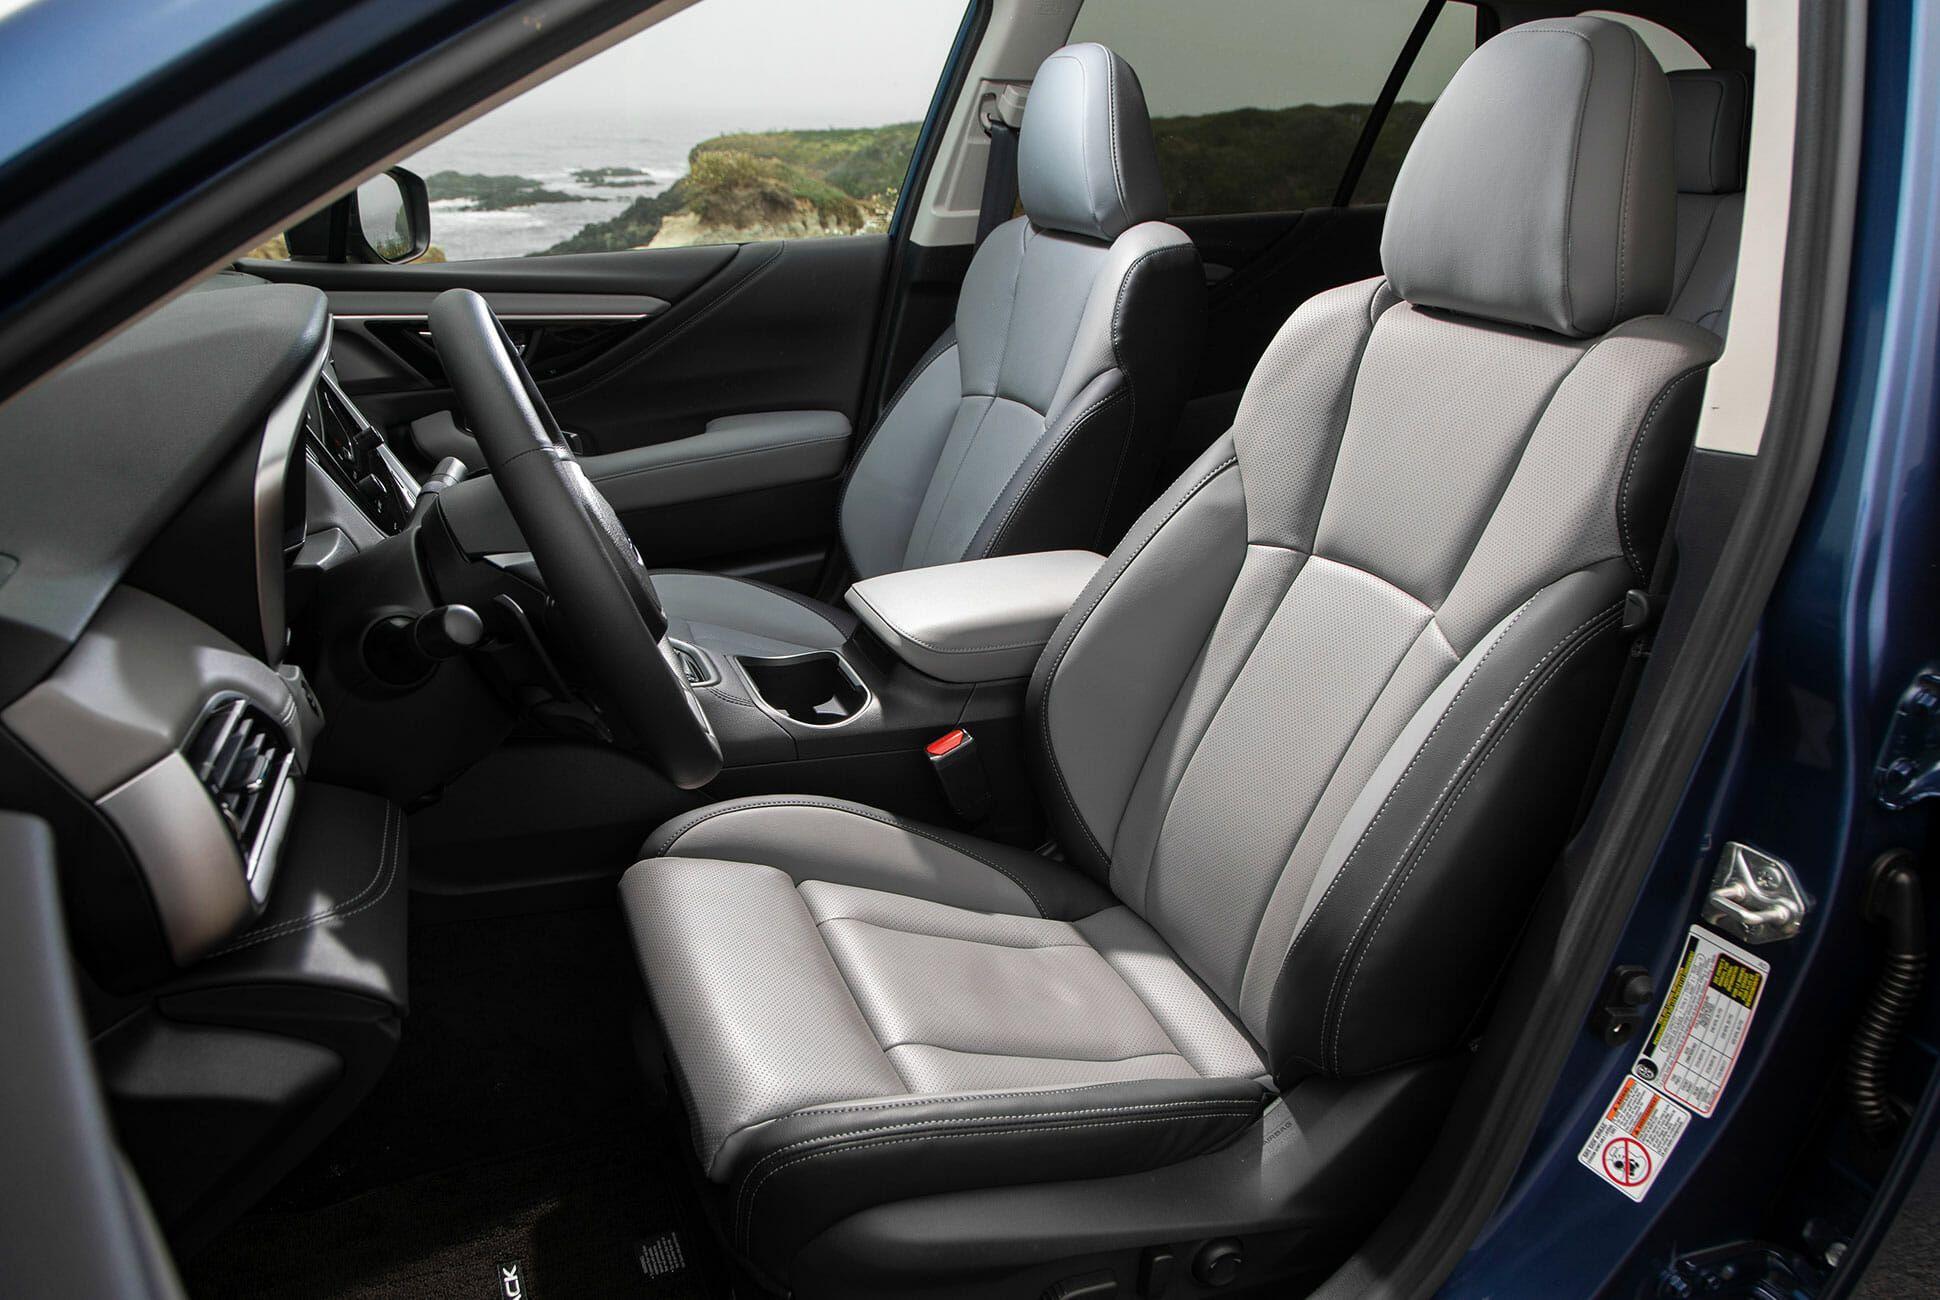 2020-Subaru-Outback-Review-gear-patrol-slide-7